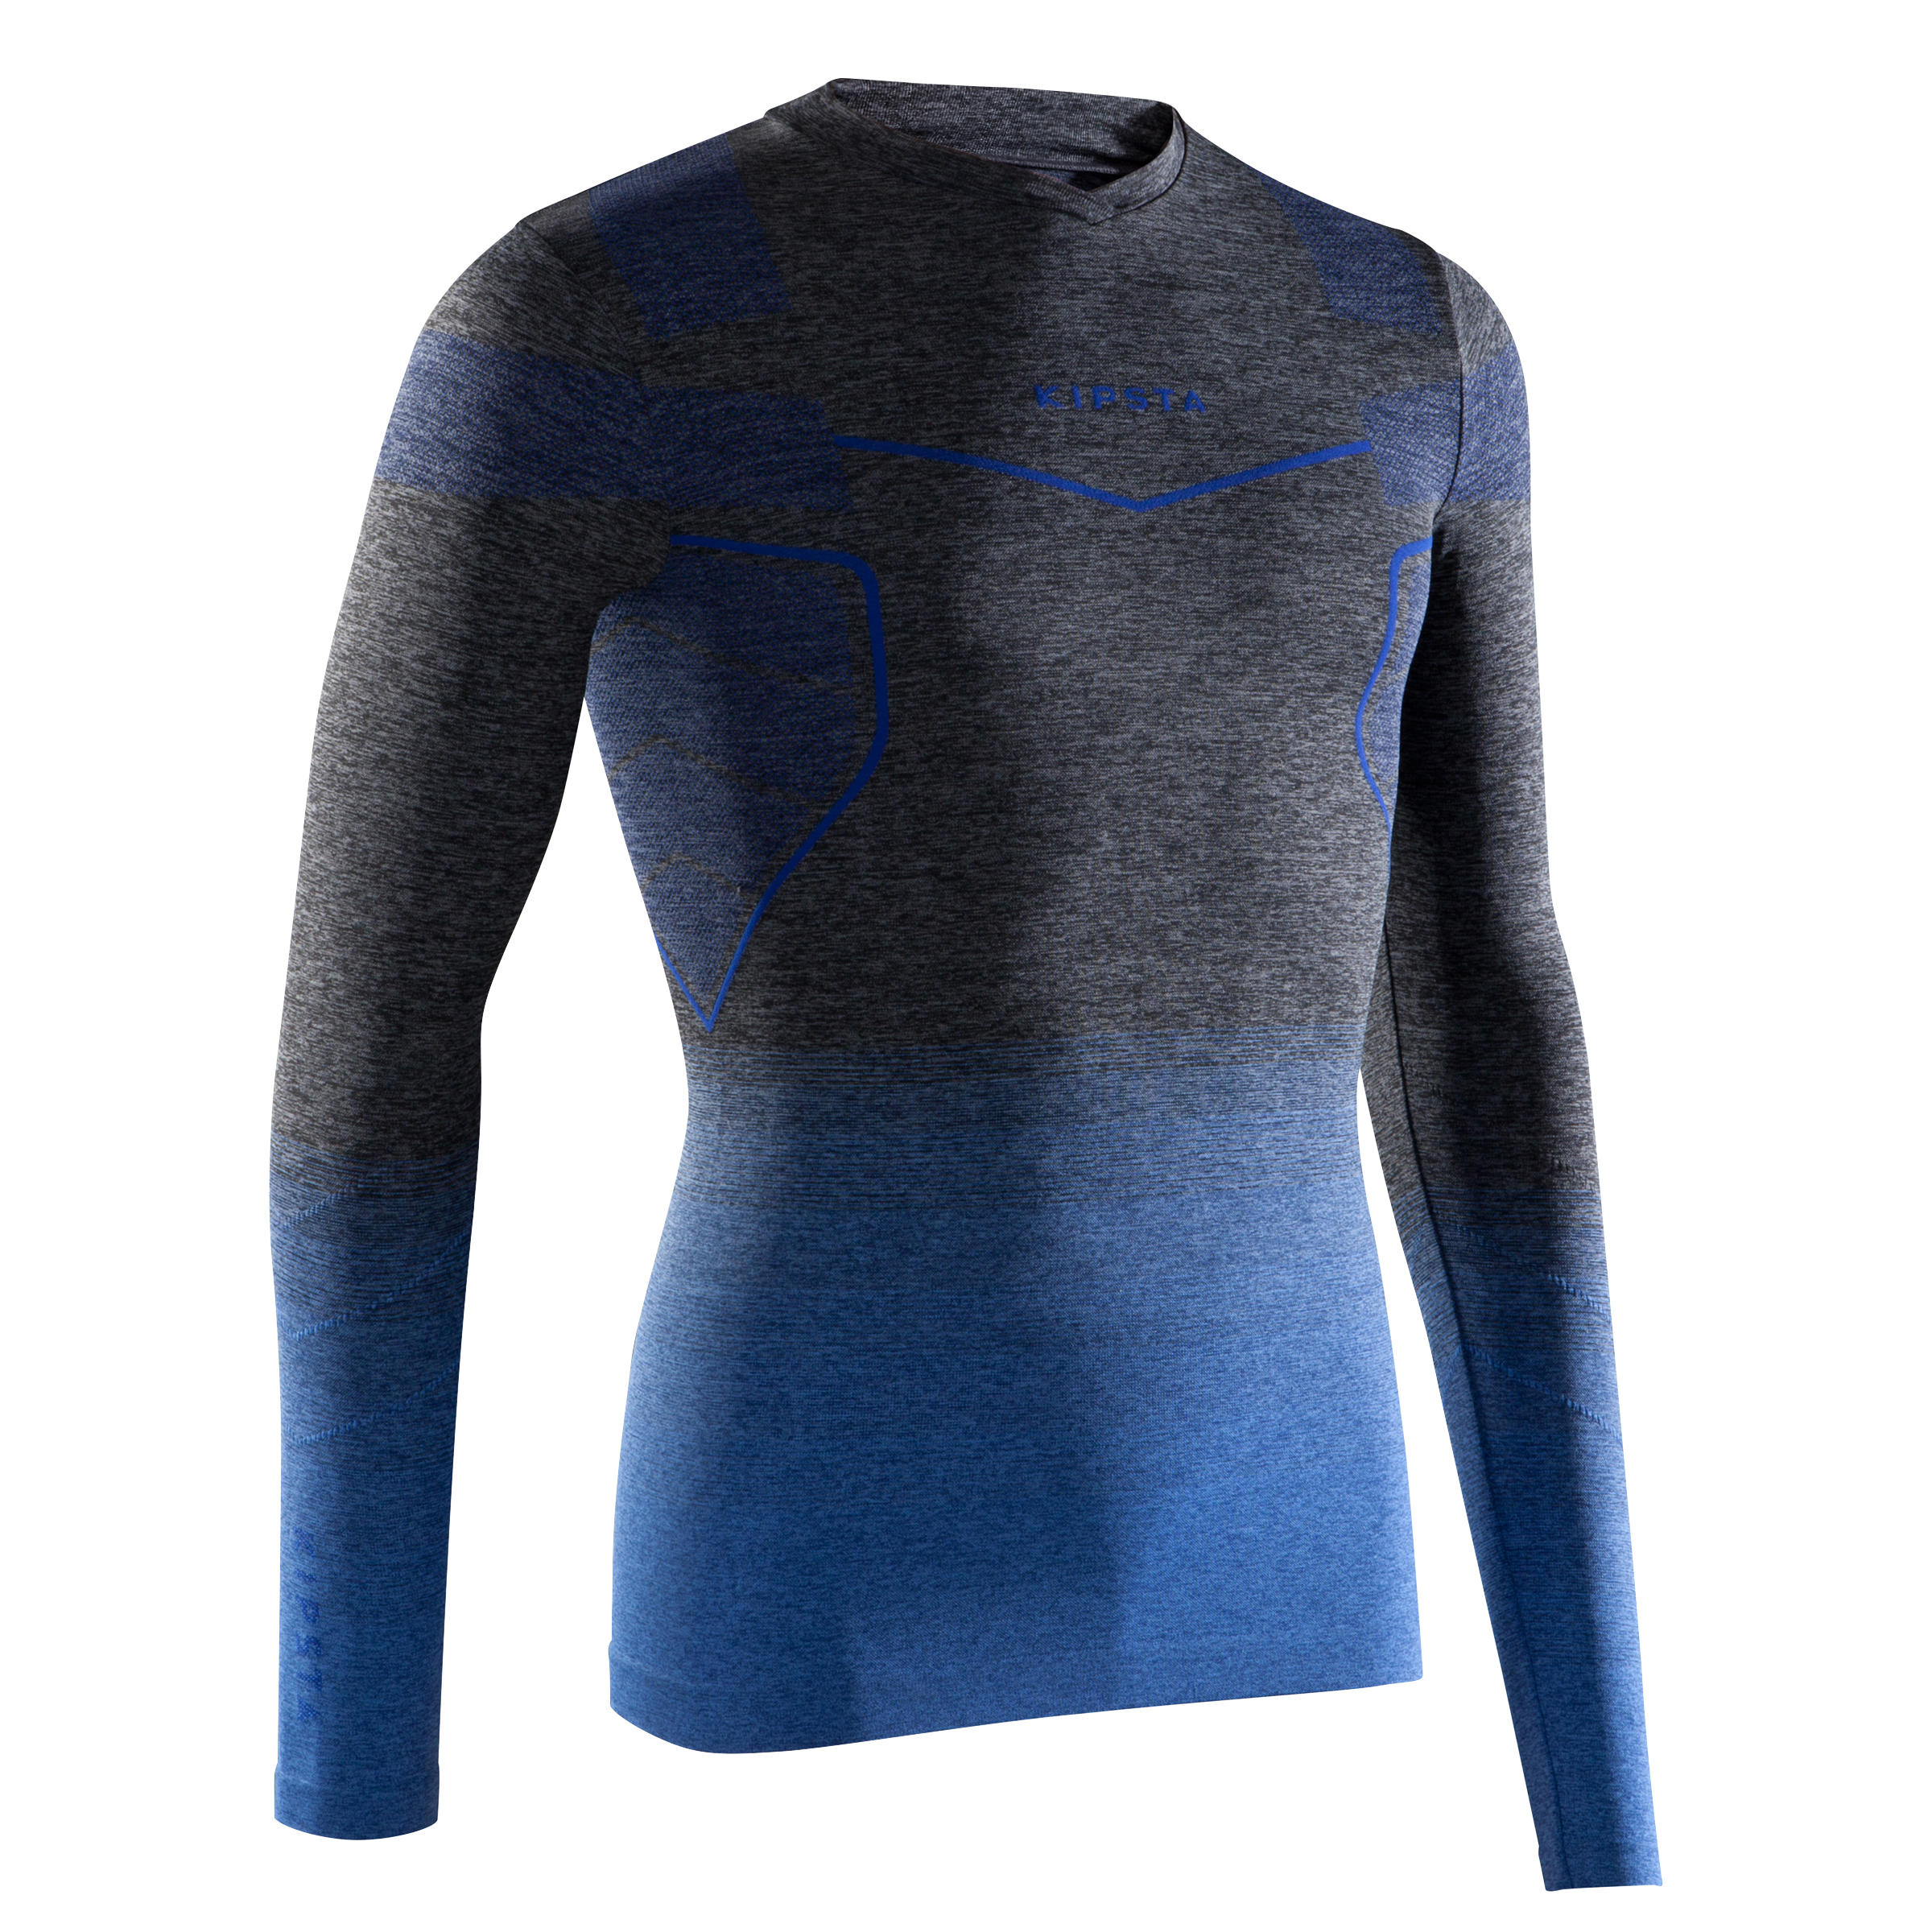 Kipsta Thermoshirt Keepdry 500 lange mouwen volwassenen